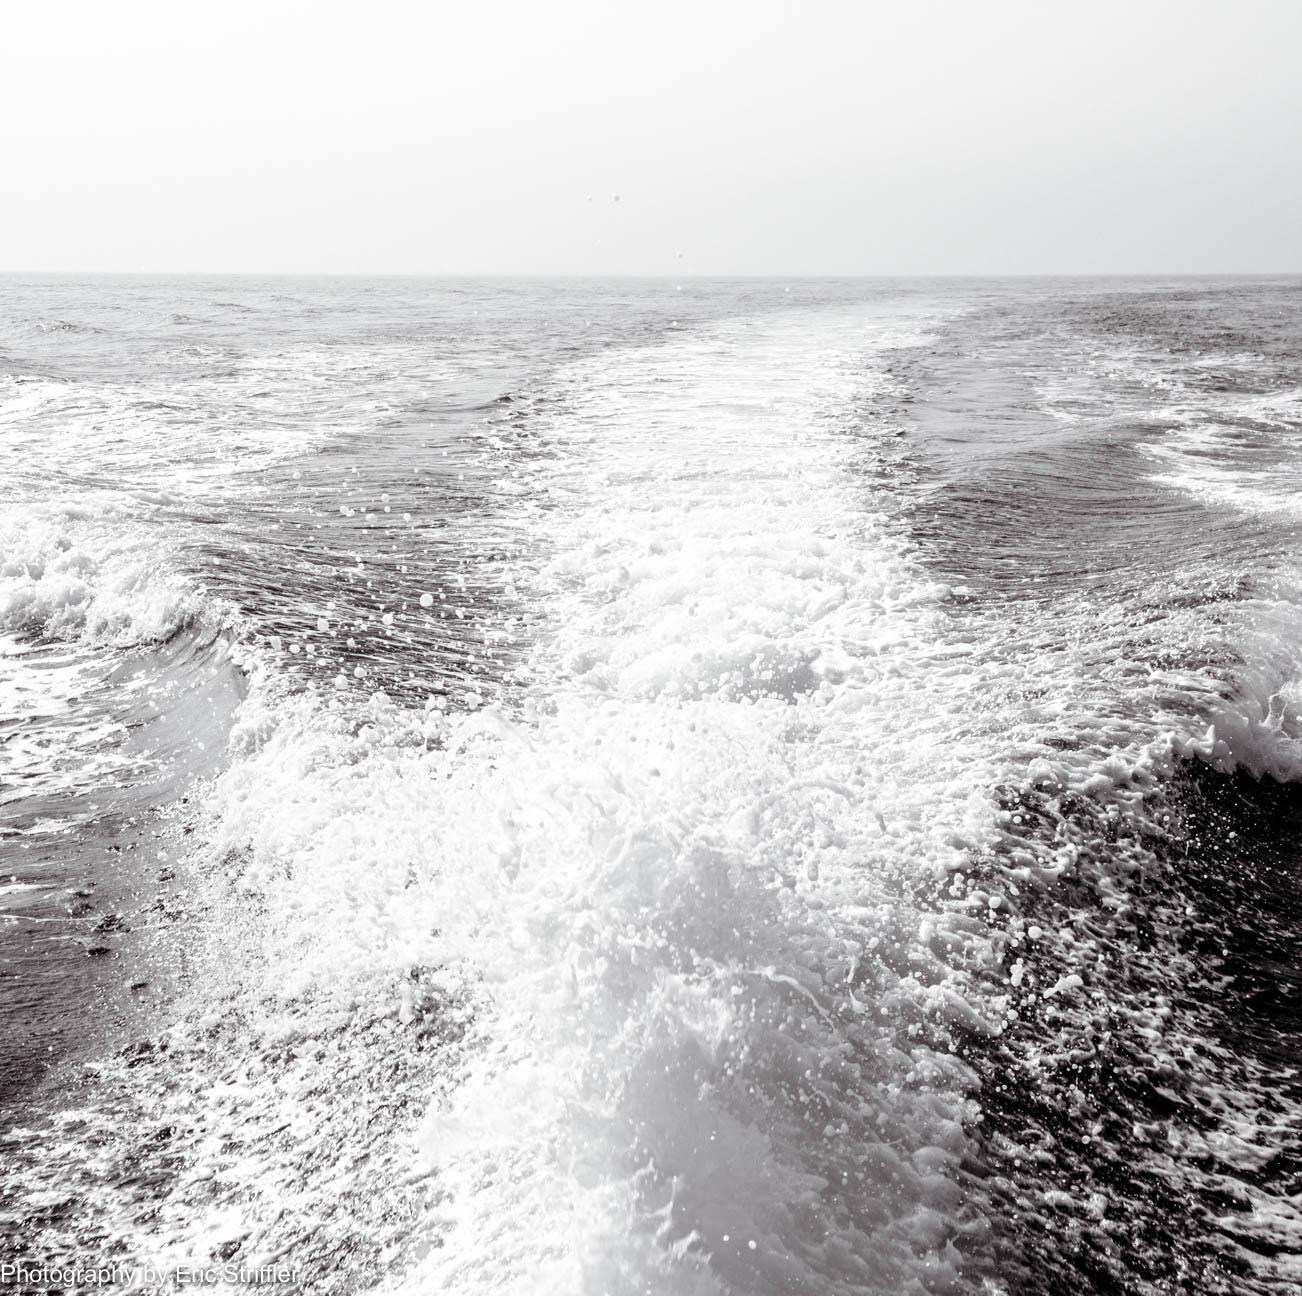 boating2018_robert_godley-9914.jpg